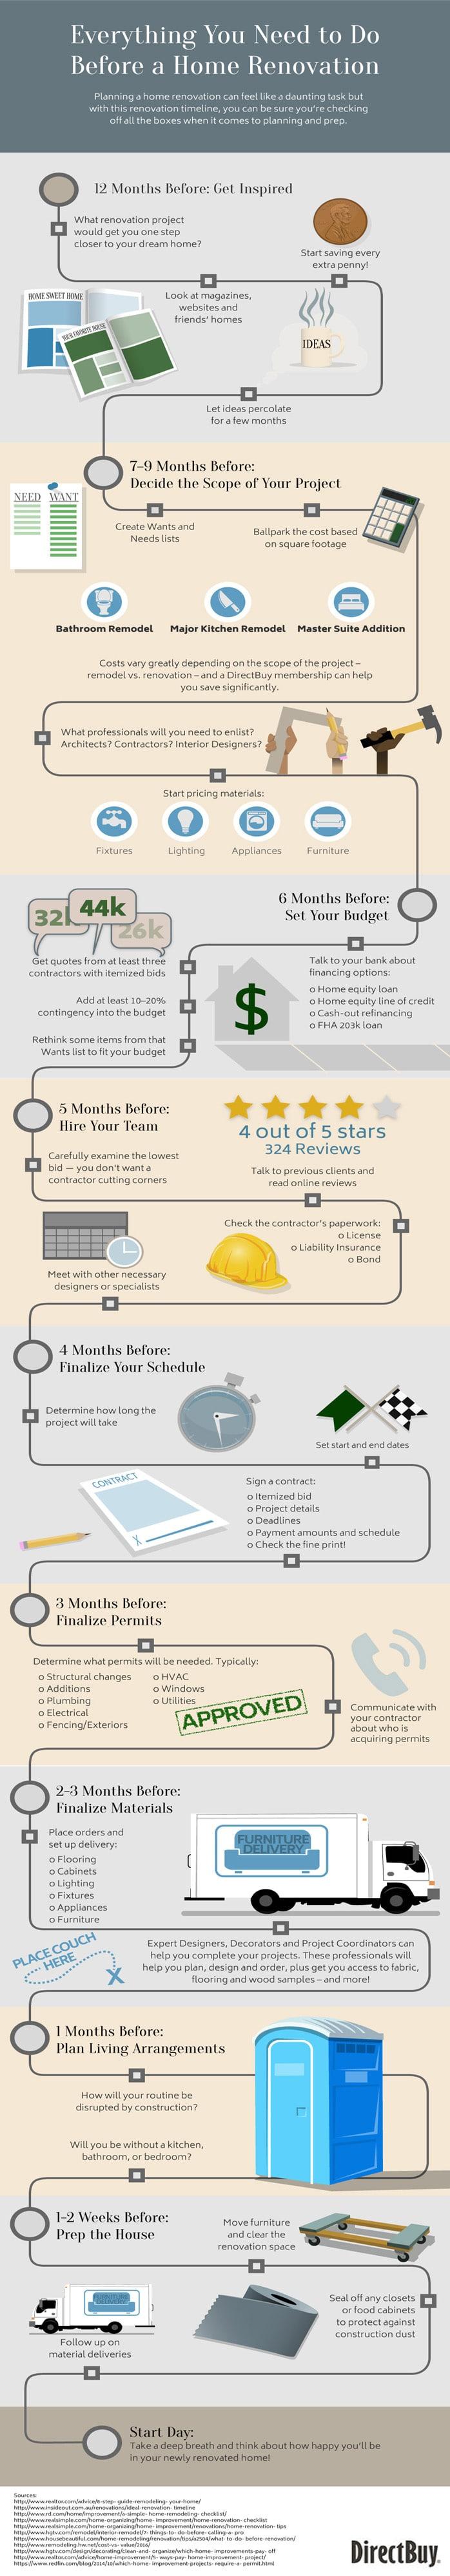 Home Renovation Prep Tips